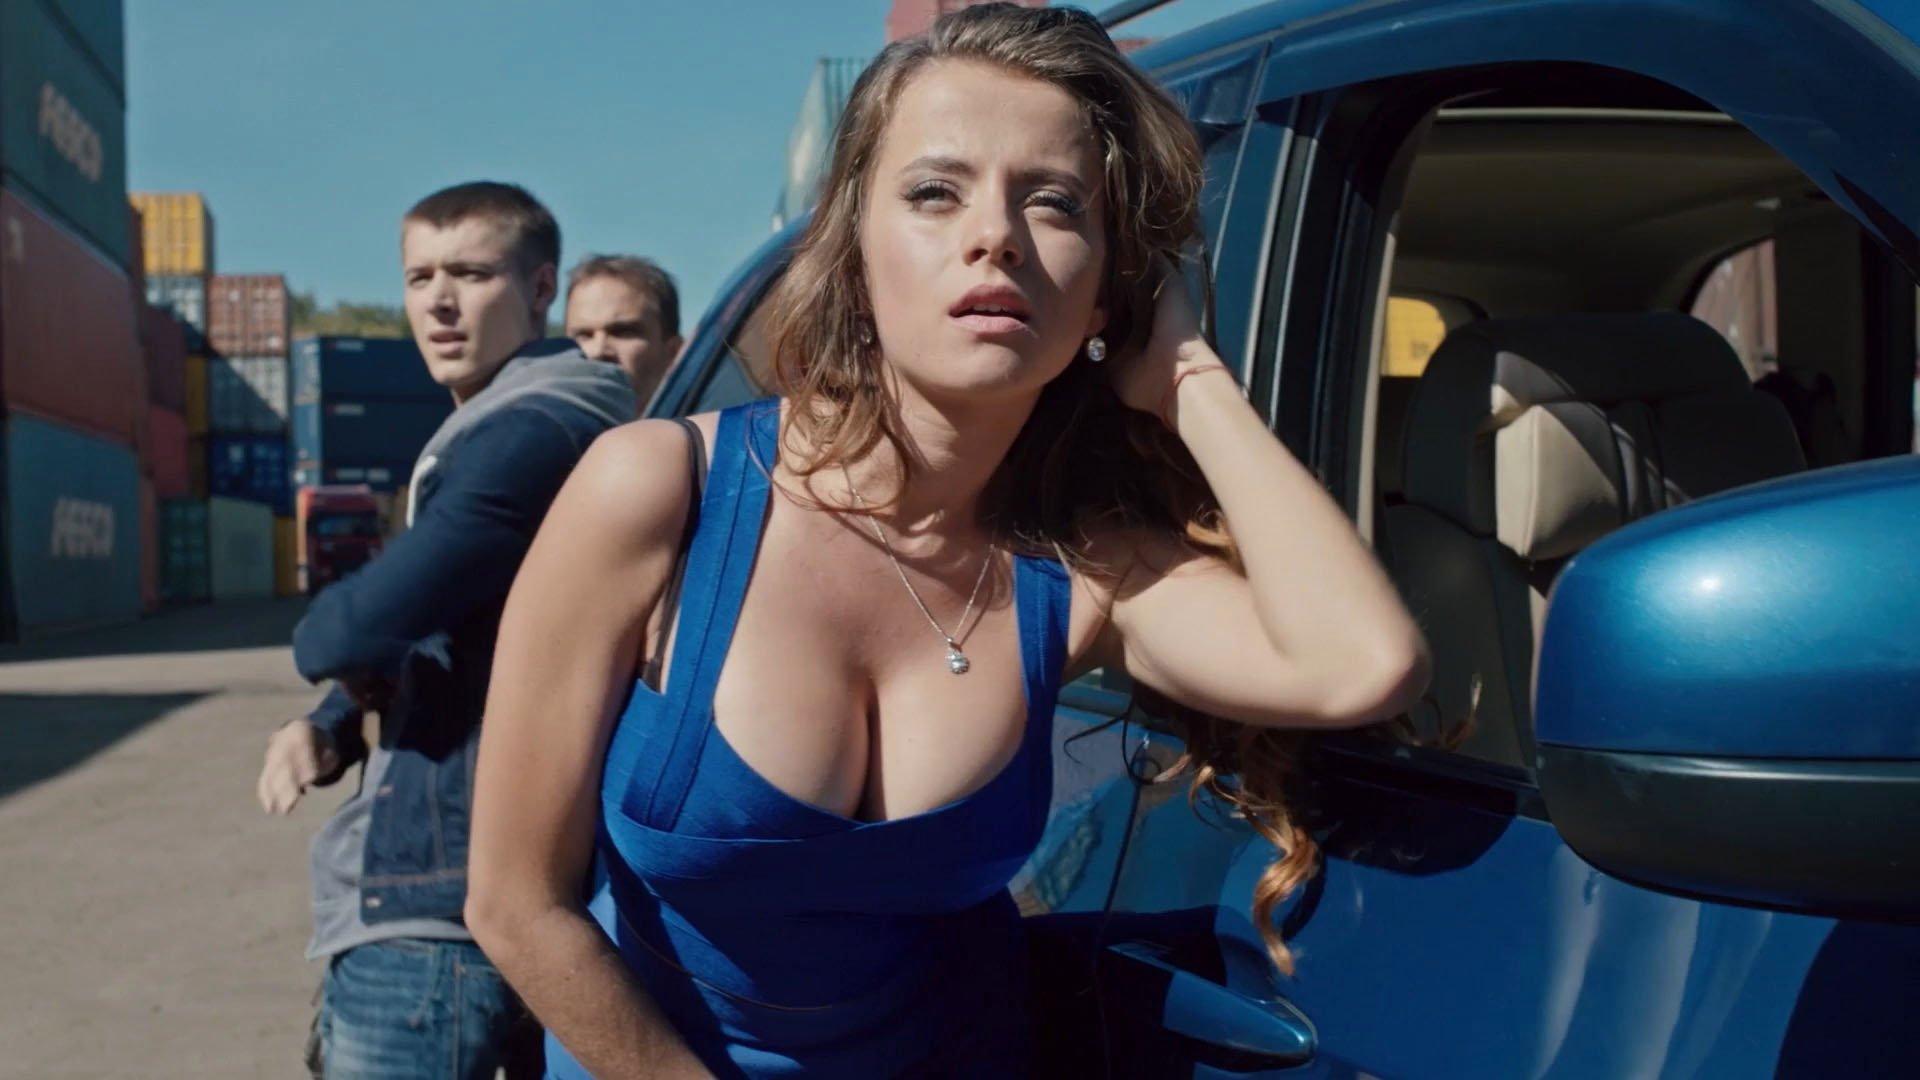 Ekaterina Kabak nude - Shameless RU s01e23 (2017)